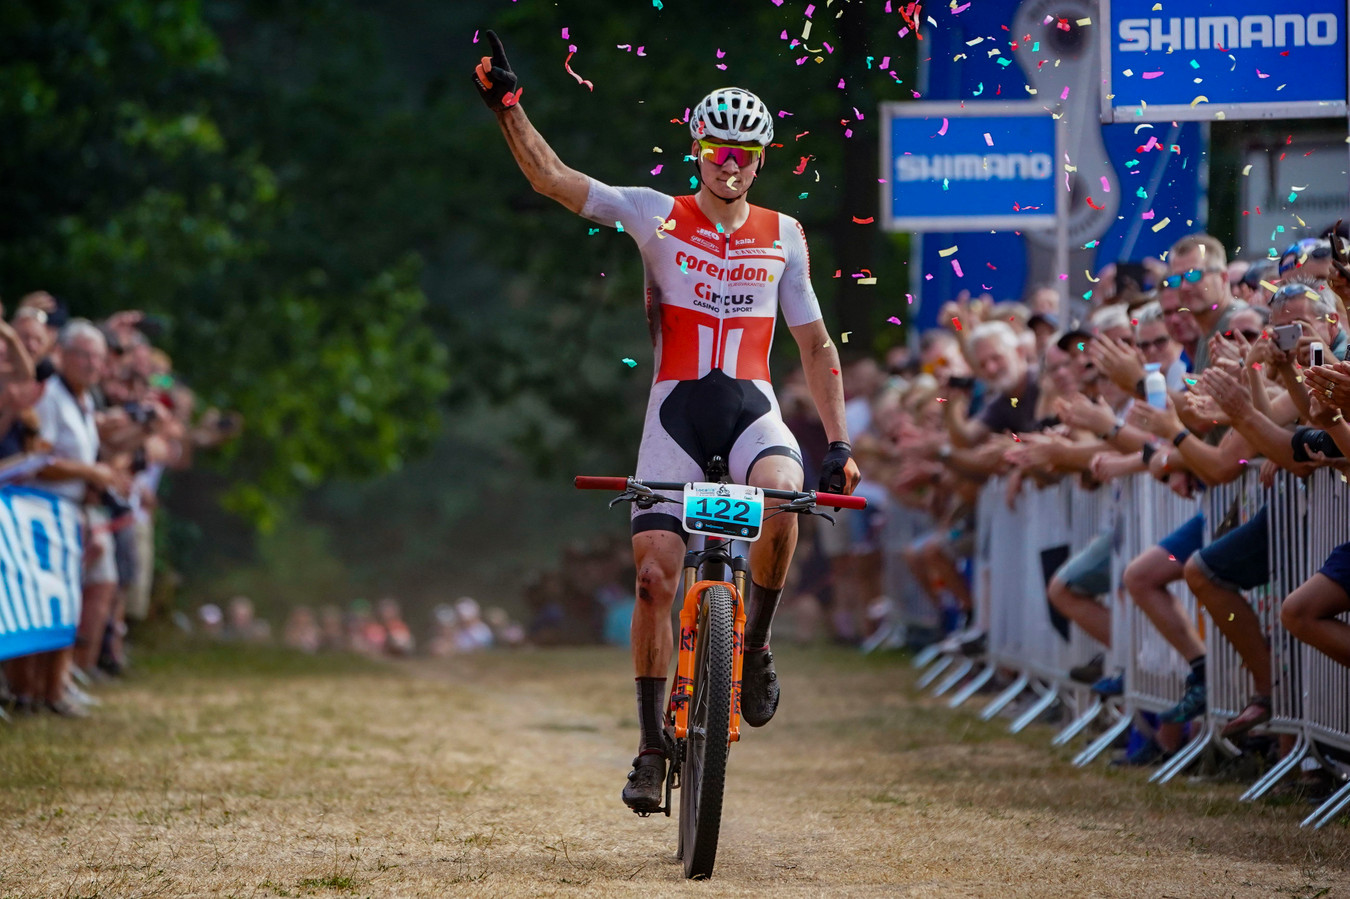 Apeldoorn - Netherlands - wielrennen - cycling - cyclisme - radsport - Mathieu van der Poel, pictured during NK Mountainbike in Apeldoorn - photo Gert Bonestroo/Cor Vos © 2018